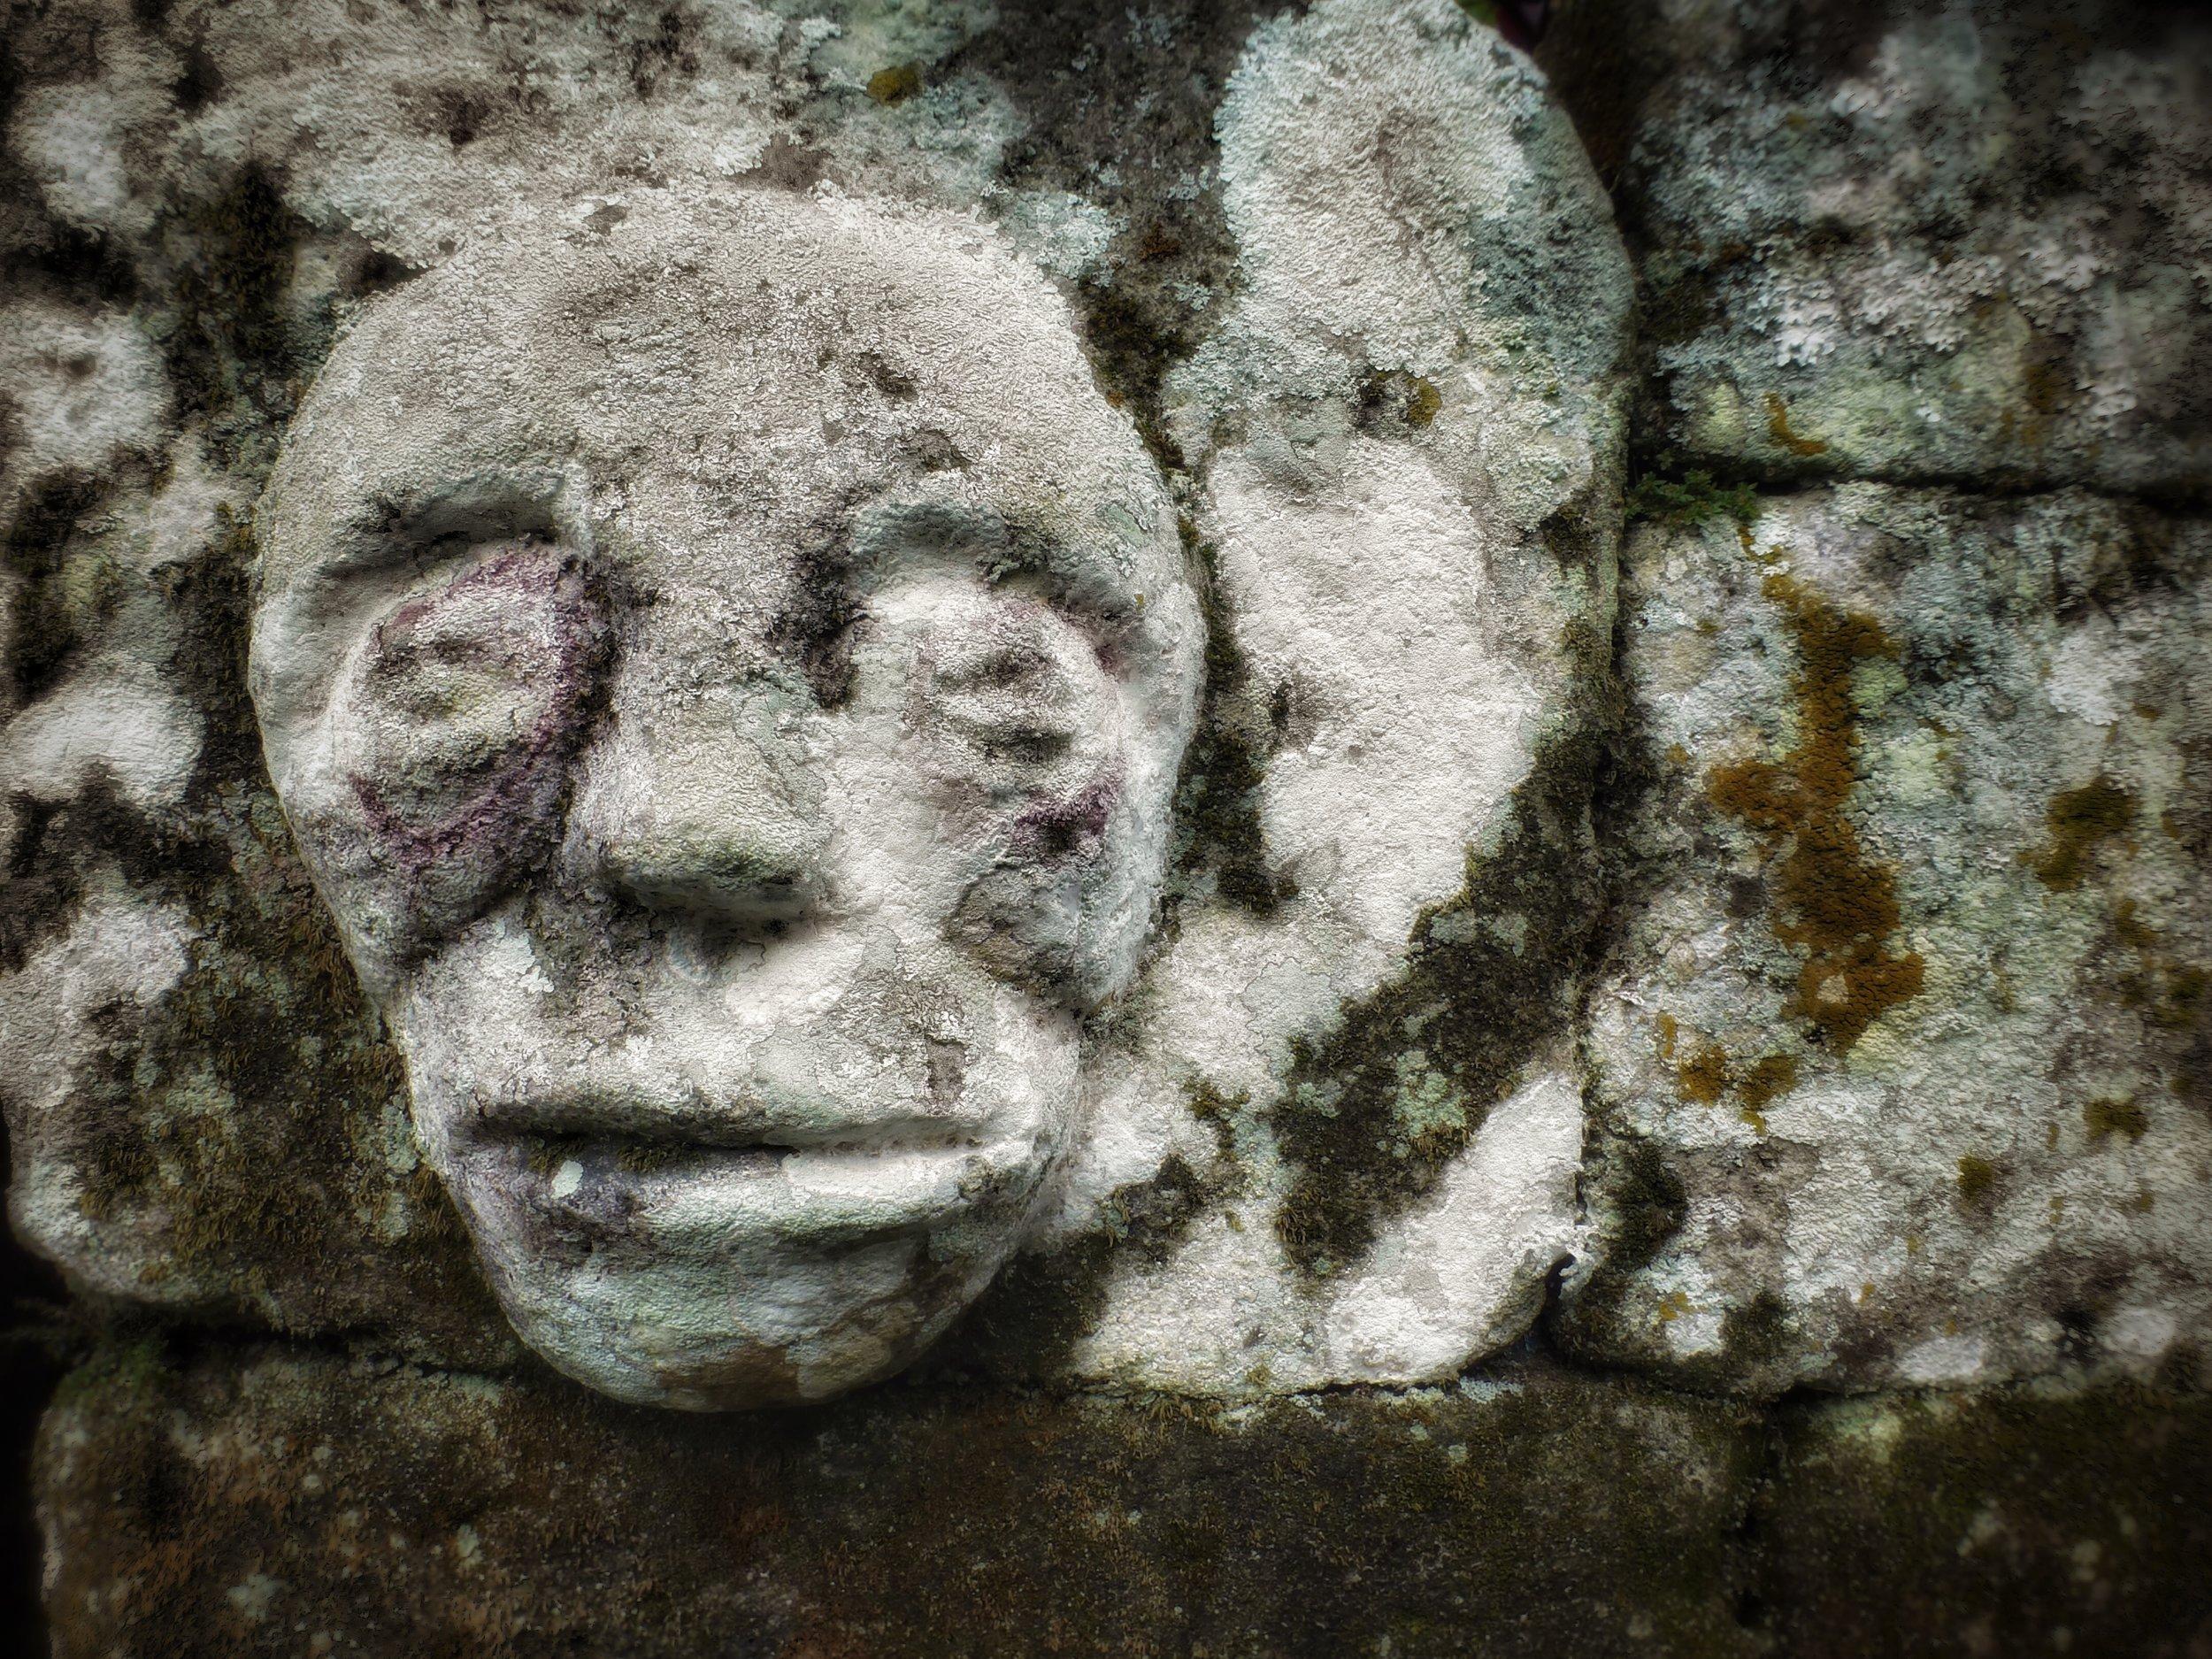 Ancient Visage